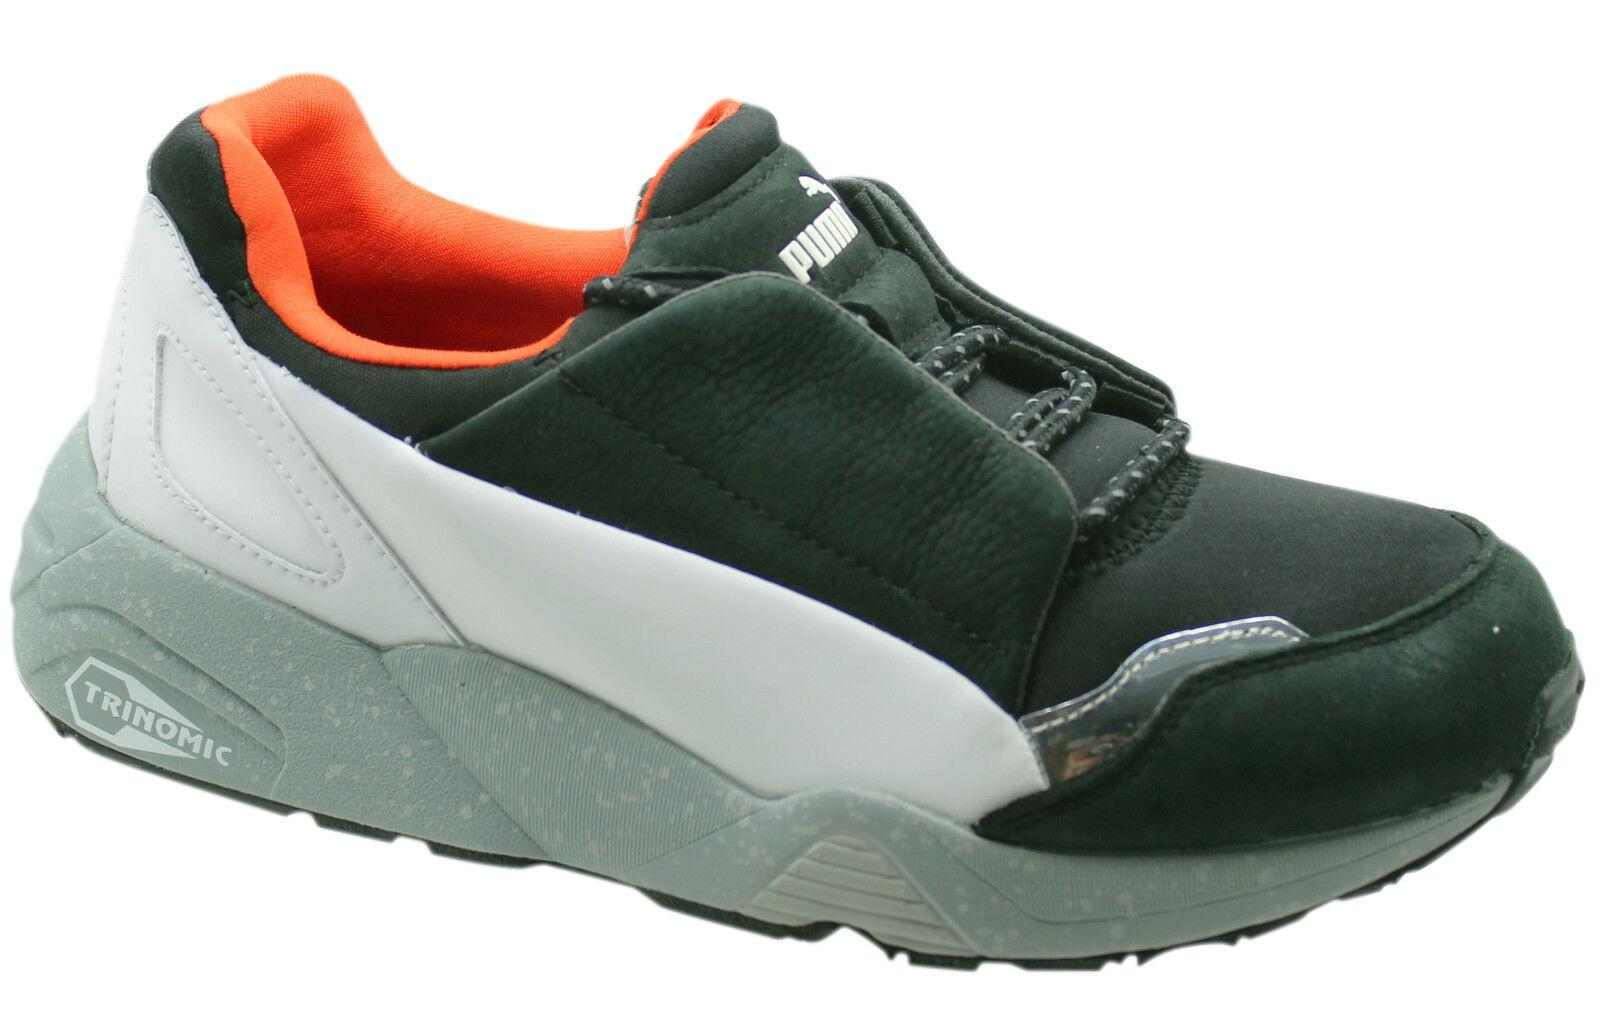 Puma Trinomic AMQ MCQ Alexander McQueen Lace Black Mens Trainers ... 8c94980f4